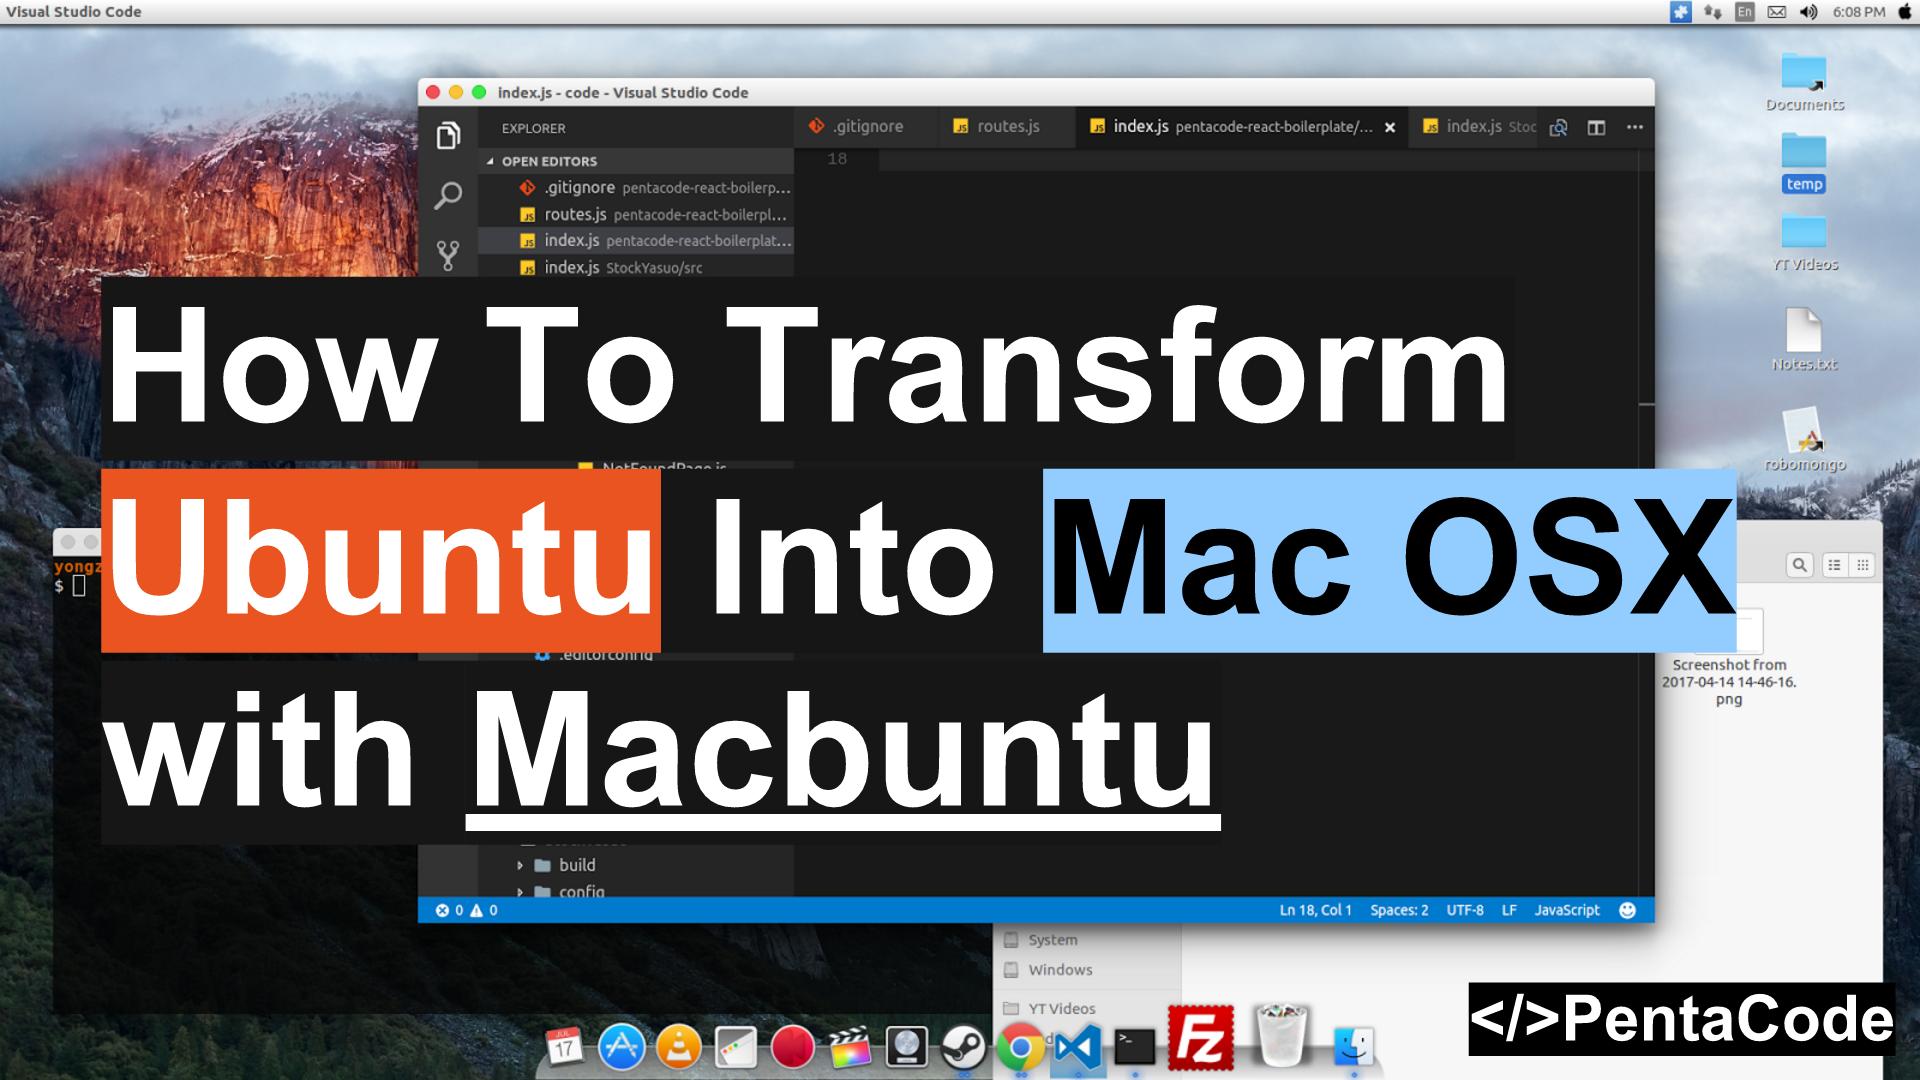 sudo apt-get install macbuntu-os-icons-lts-v7